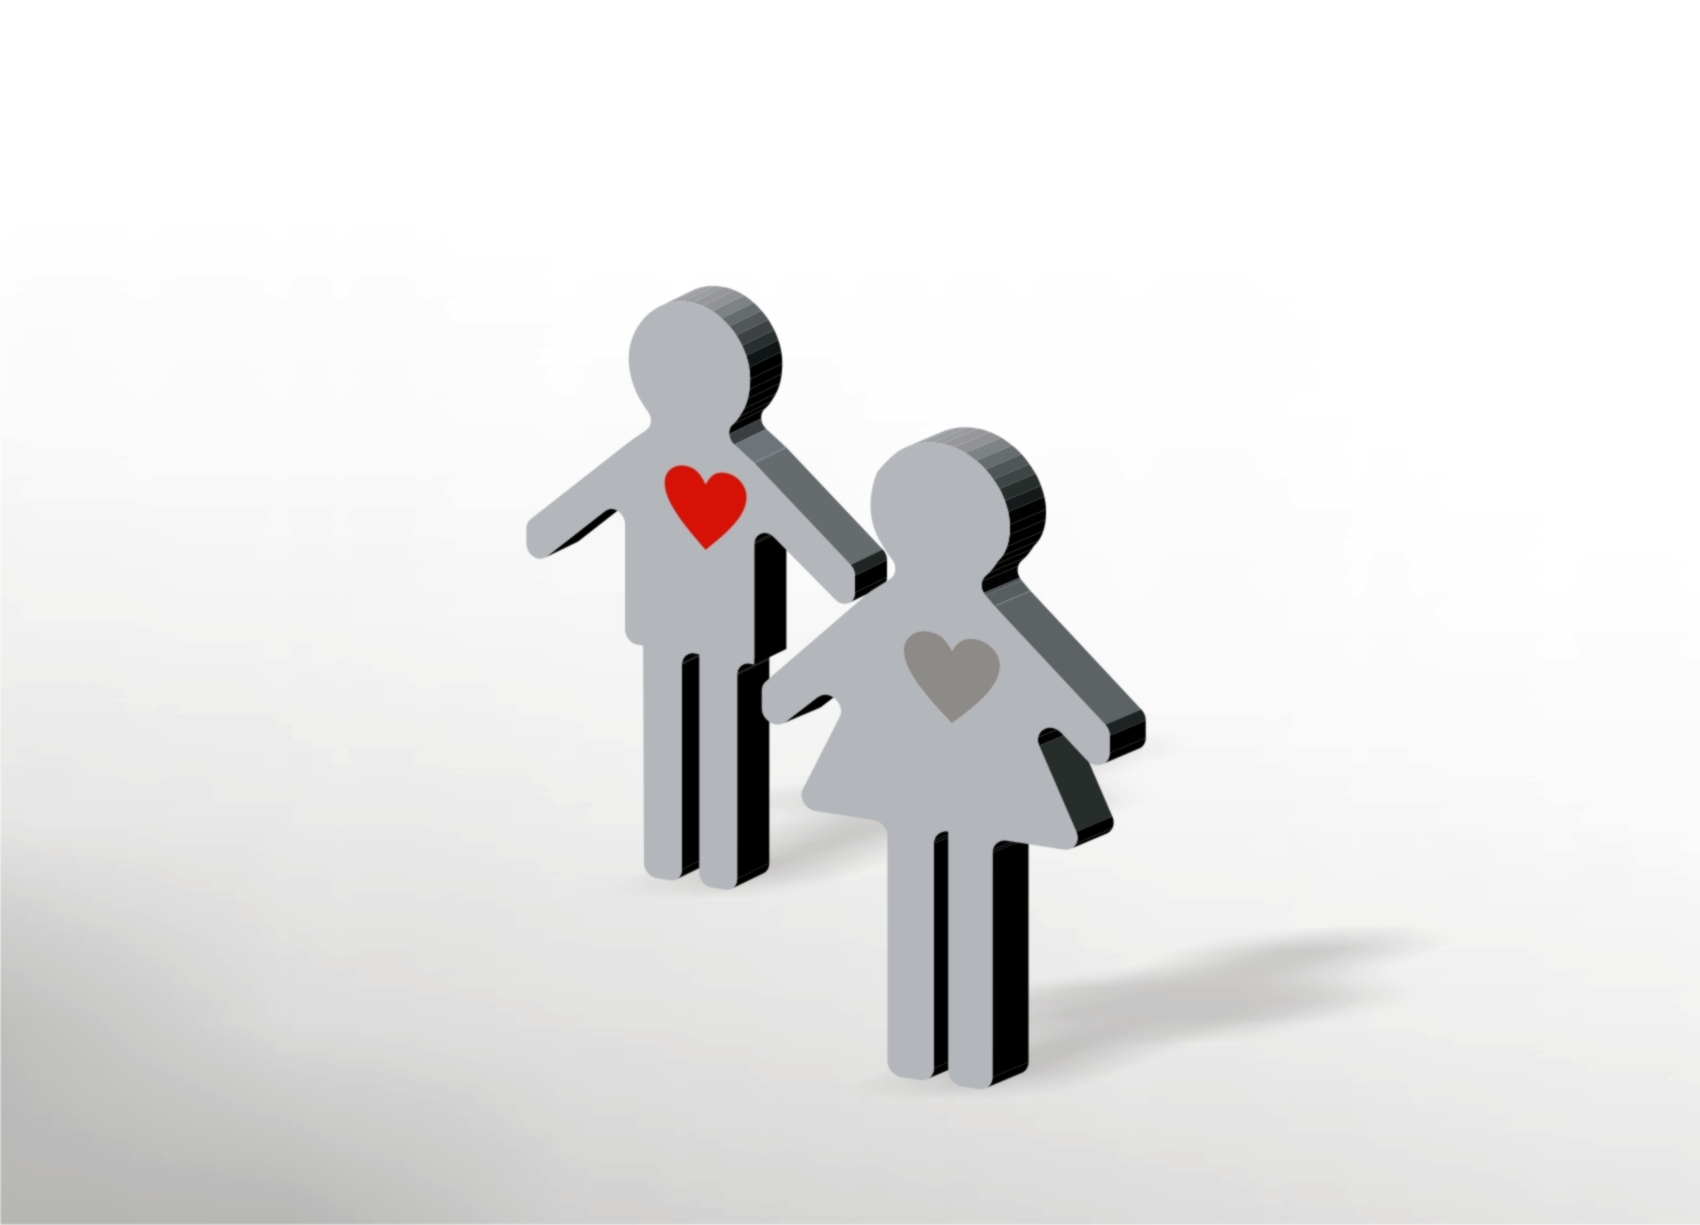 http://deirdrehayes.ie/wp-content/uploads/2014/10/Cutout-Couple.jpg